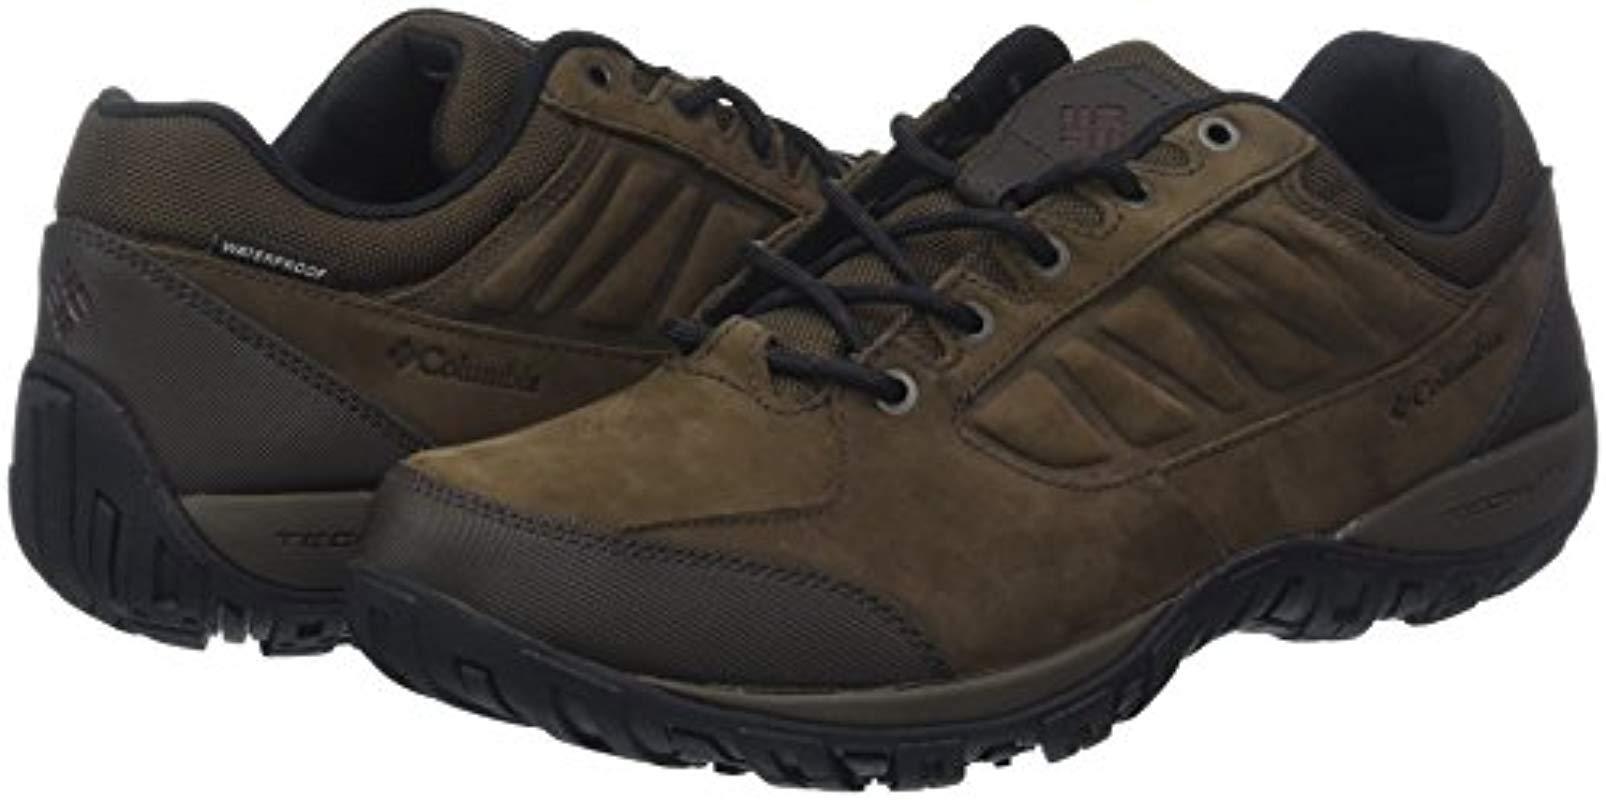 Columbia Hiking Shoes, Ruckel Ridge